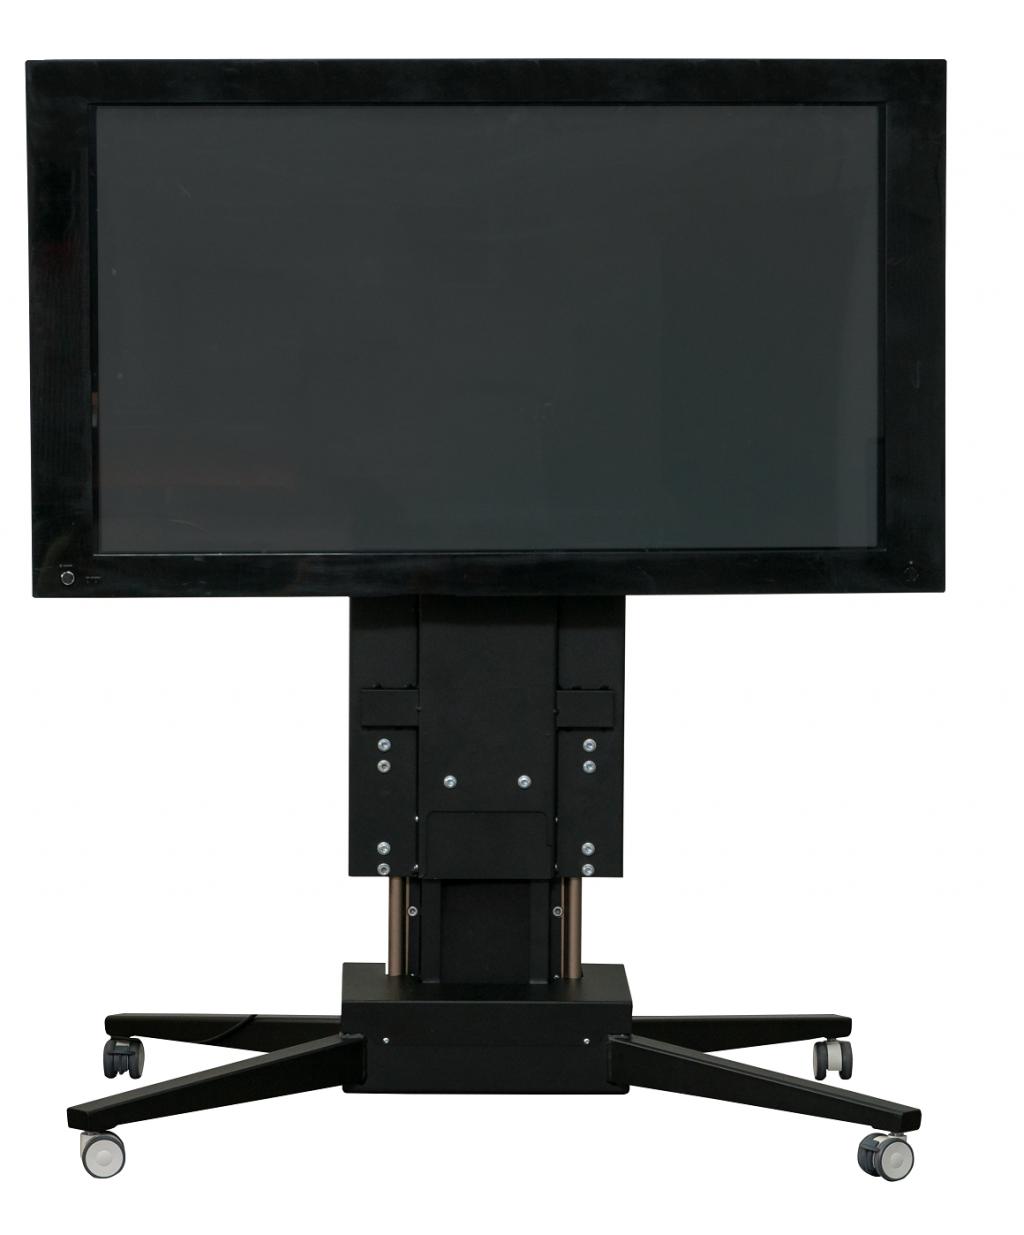 Mobil Tv - Lyft / Hiss 65cm lyfthöjd, 80kg kapacitet